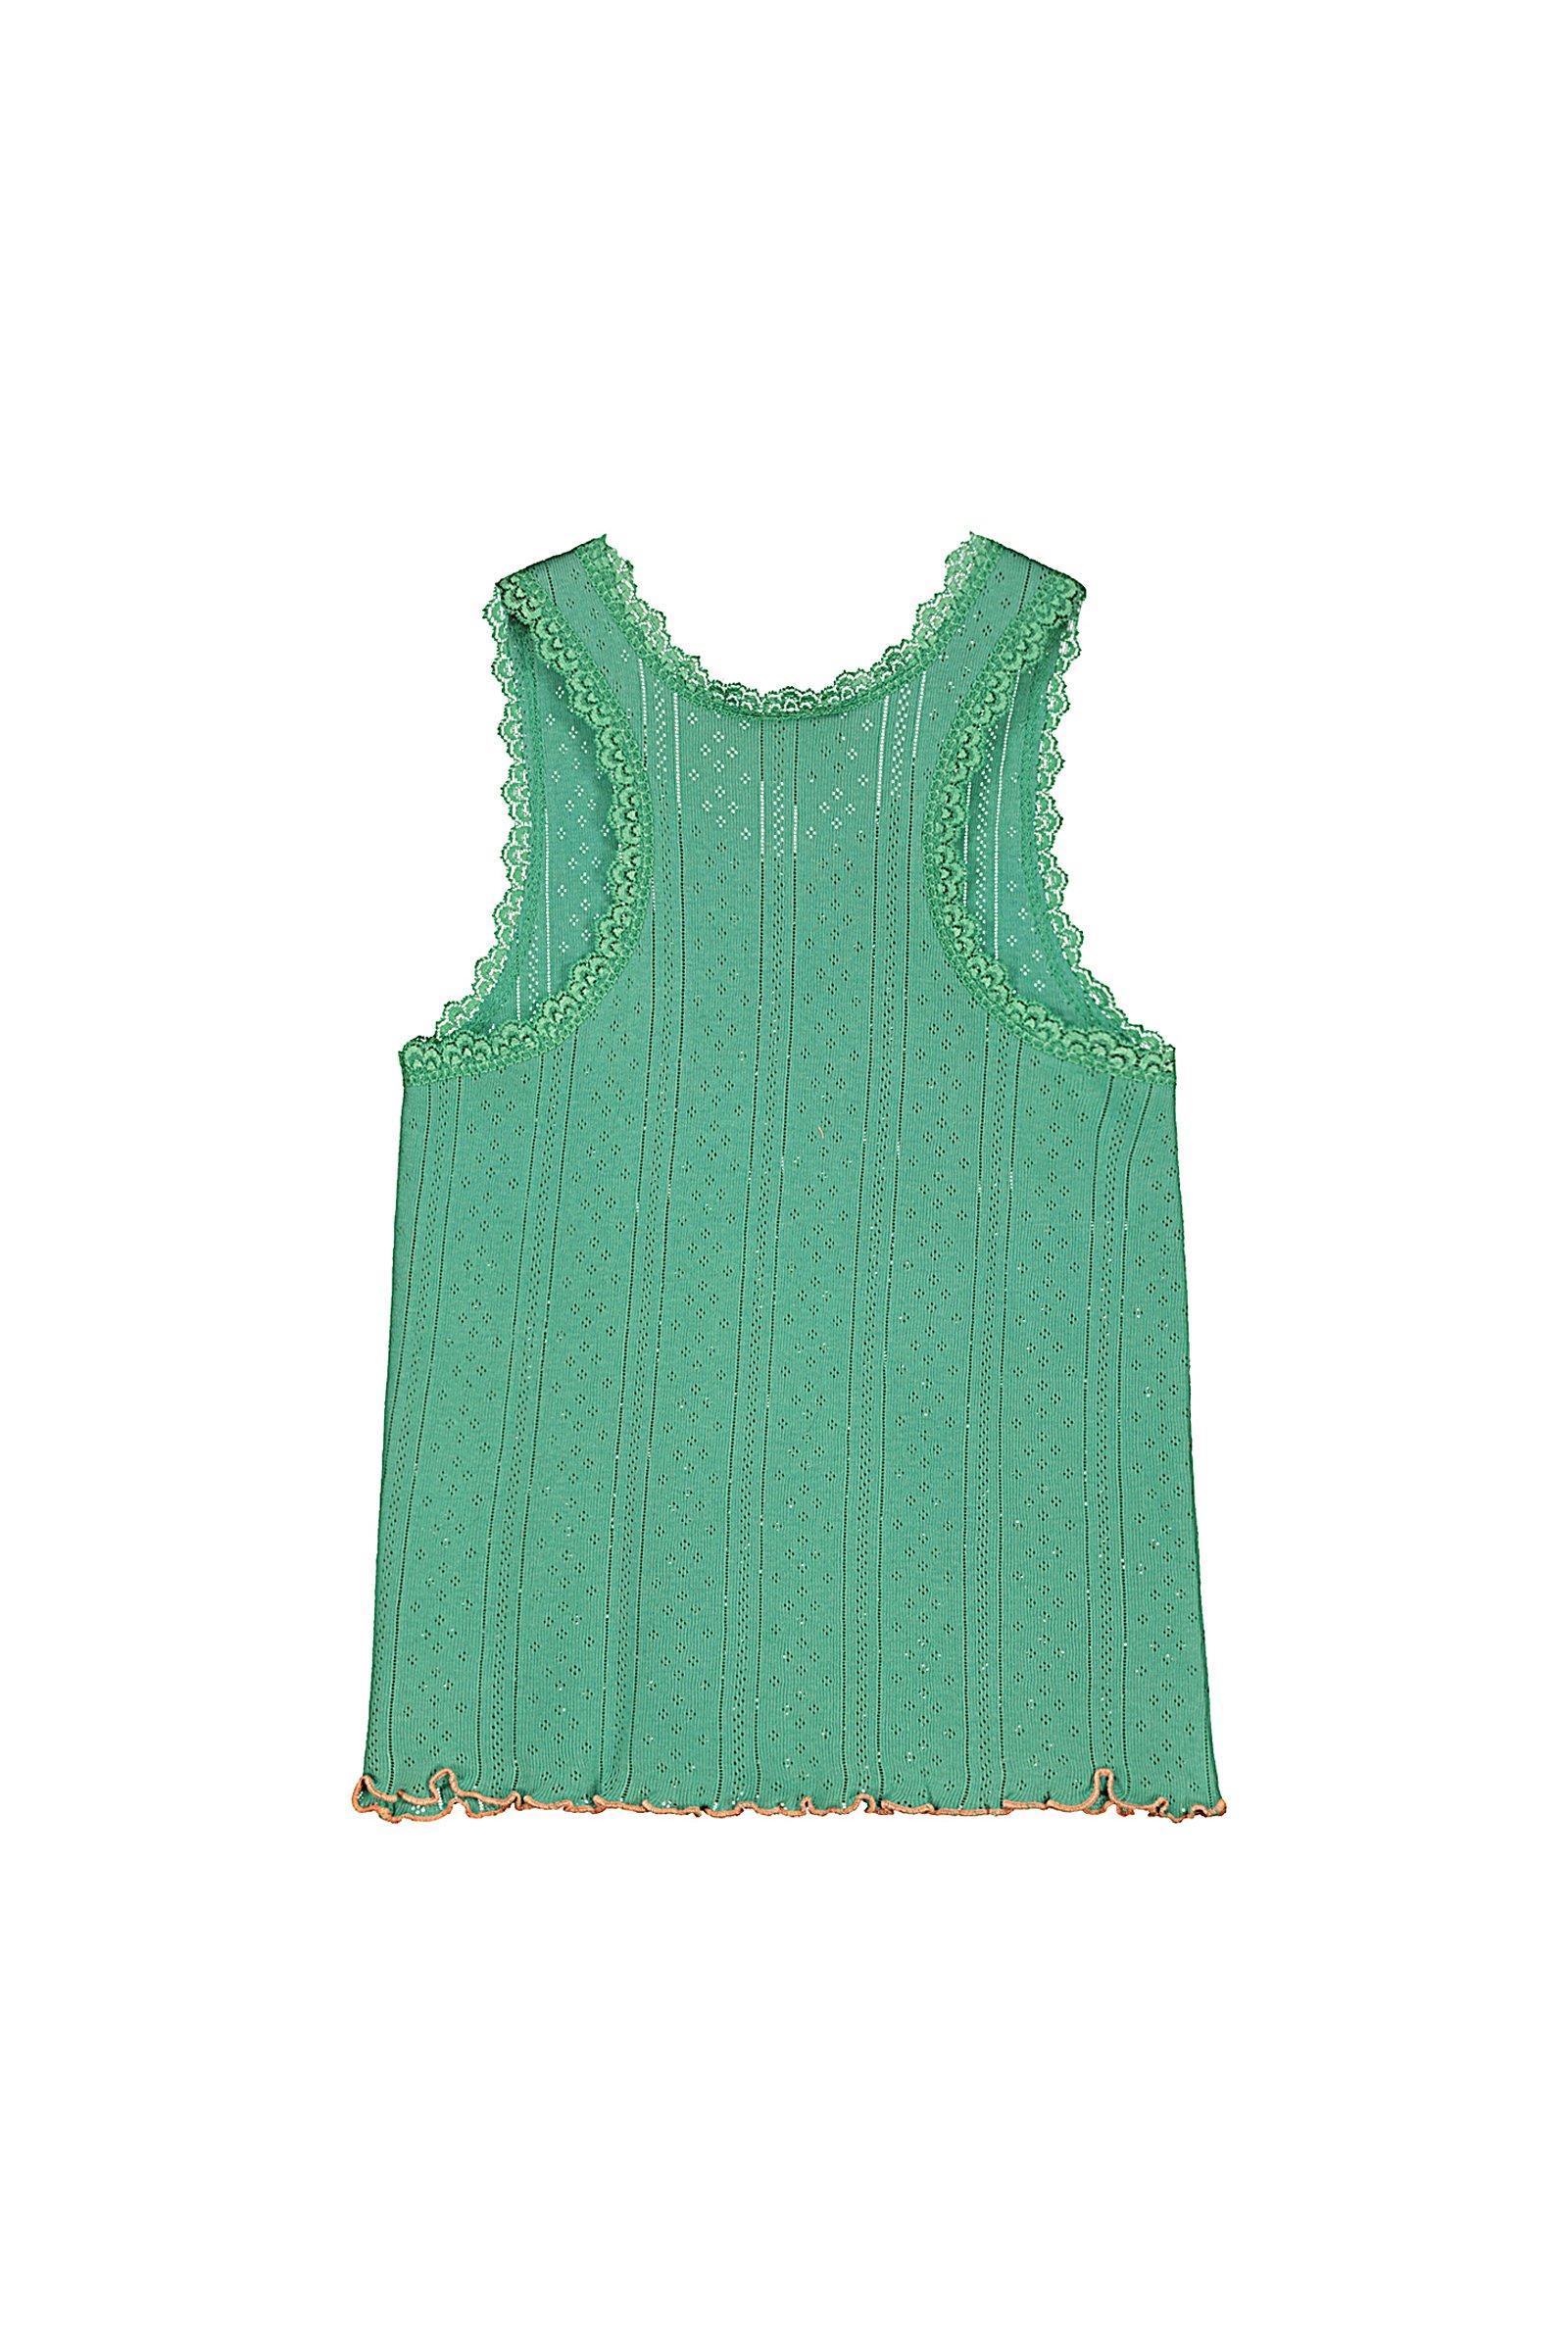 https://webmedia.cks-fashion.com/i/cks/123118GNM_100_h